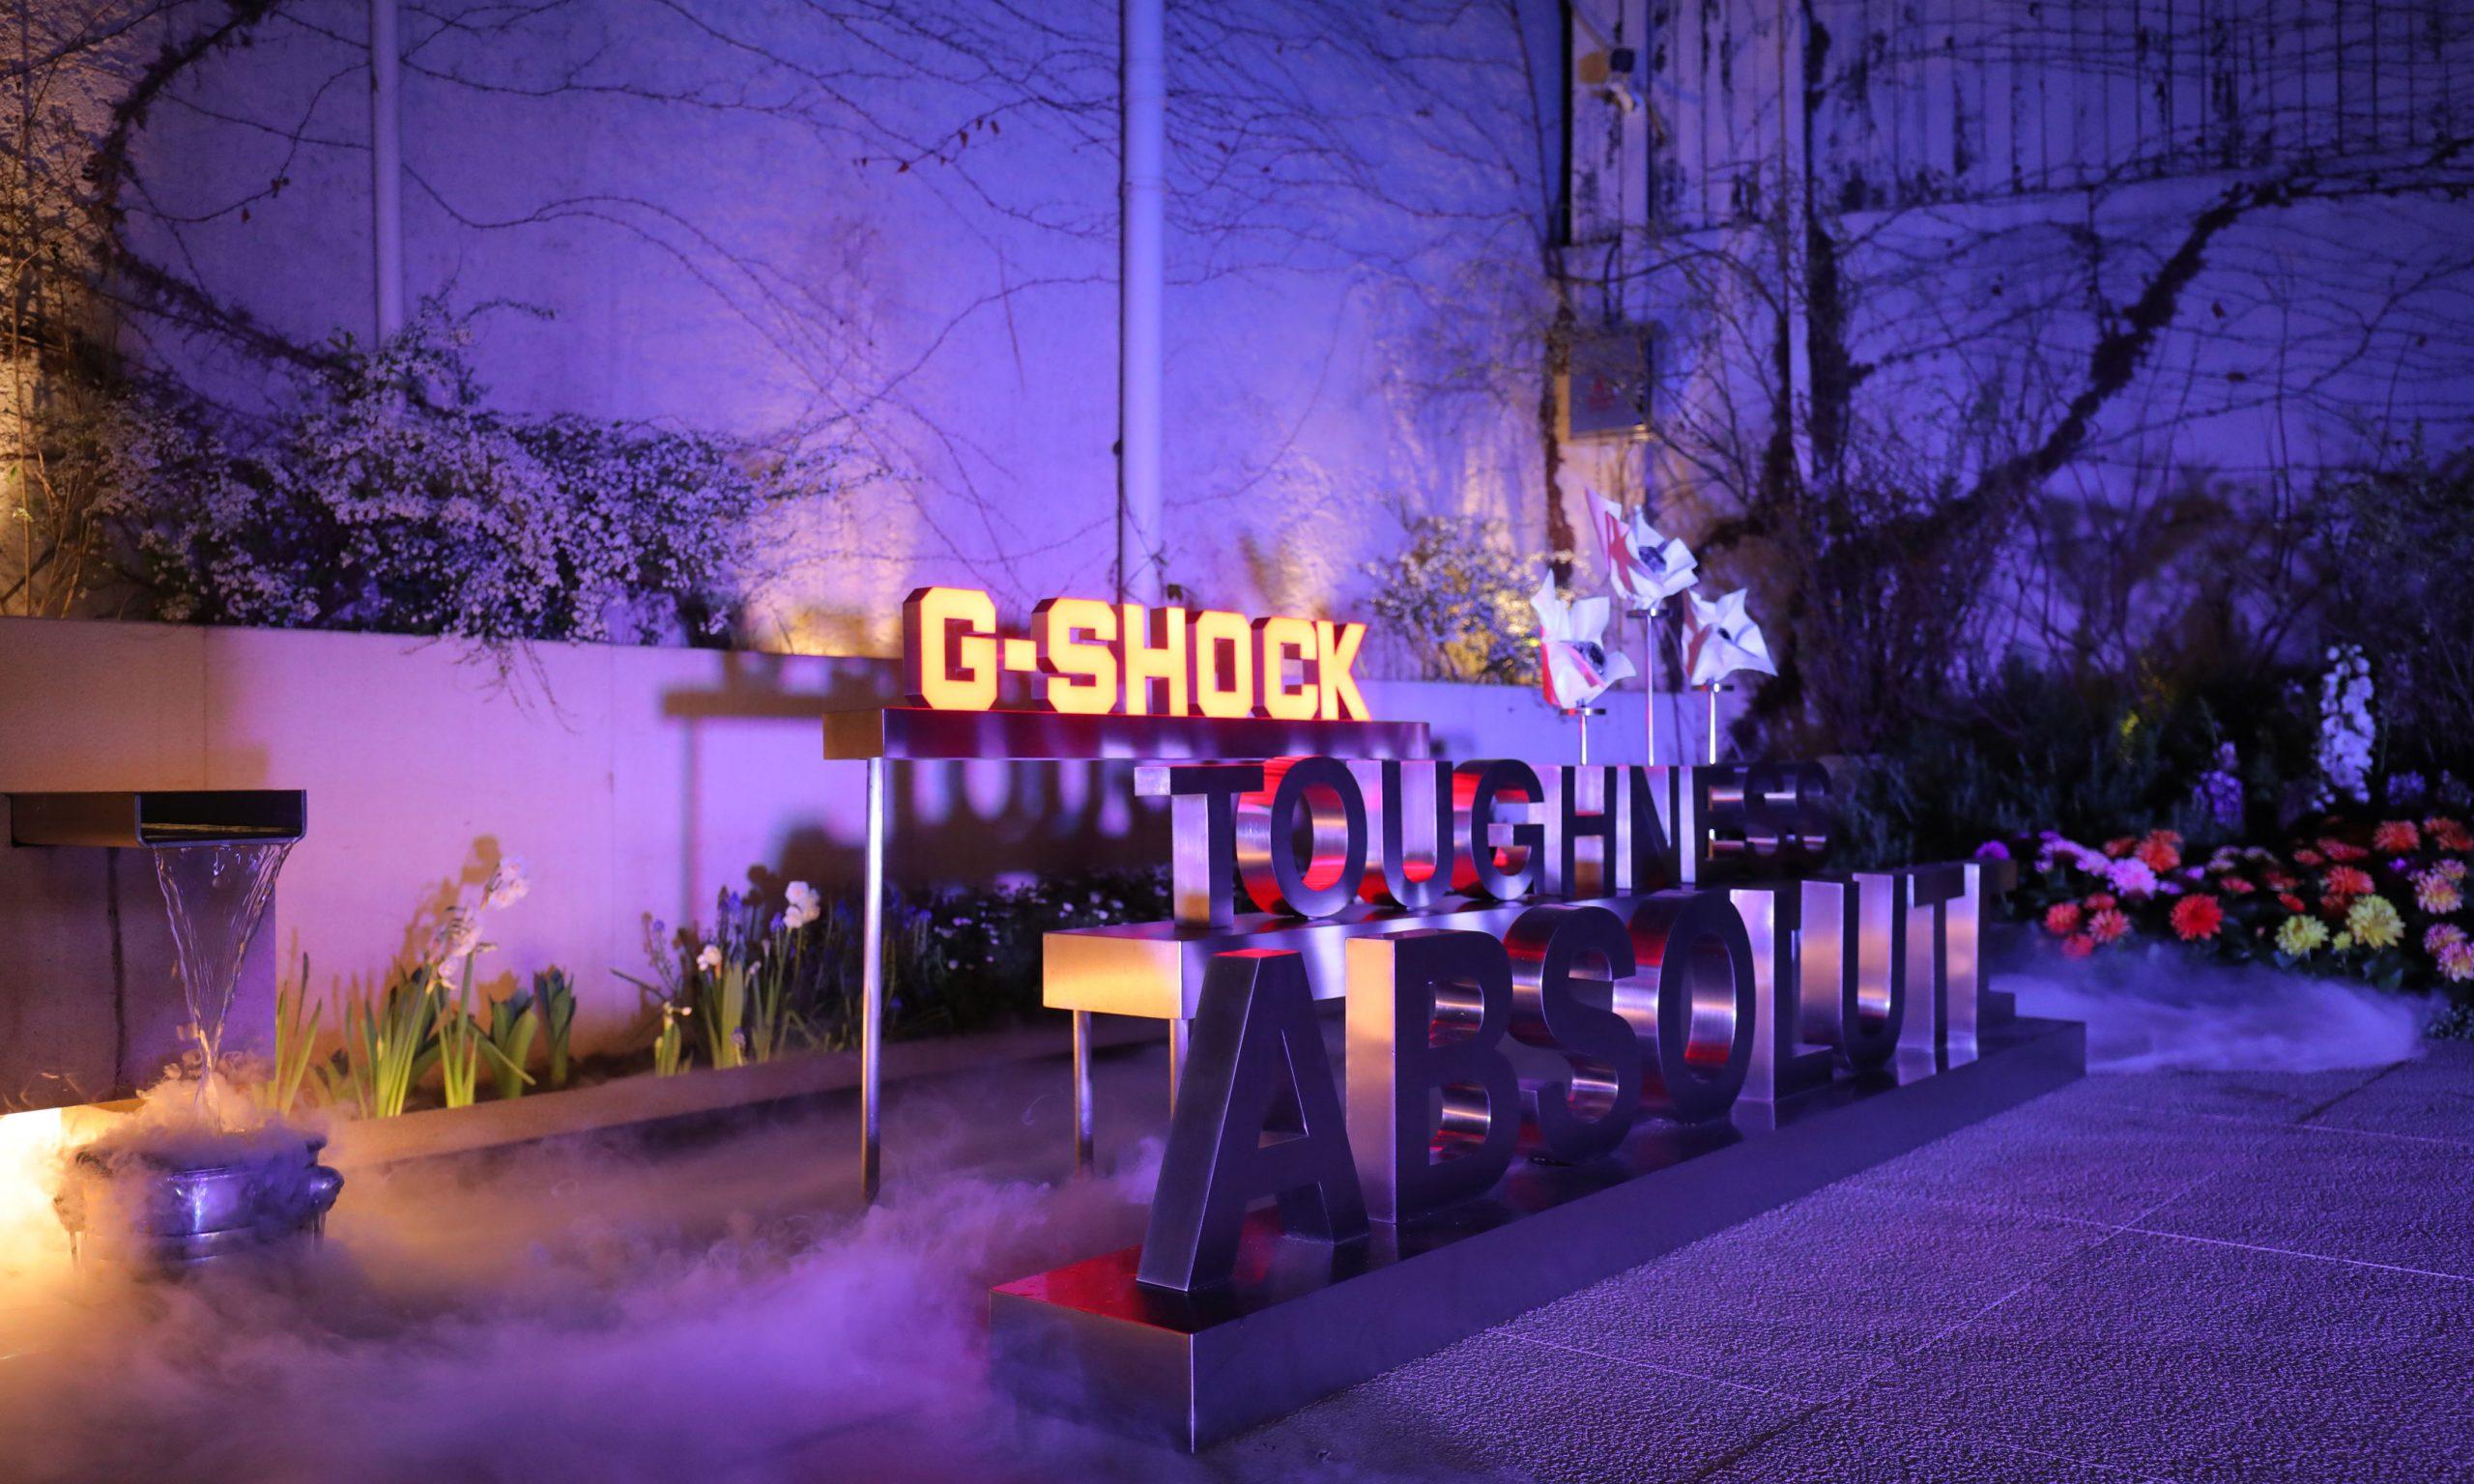 G-SHOCK 举办「冰韧」系列限时快闪店